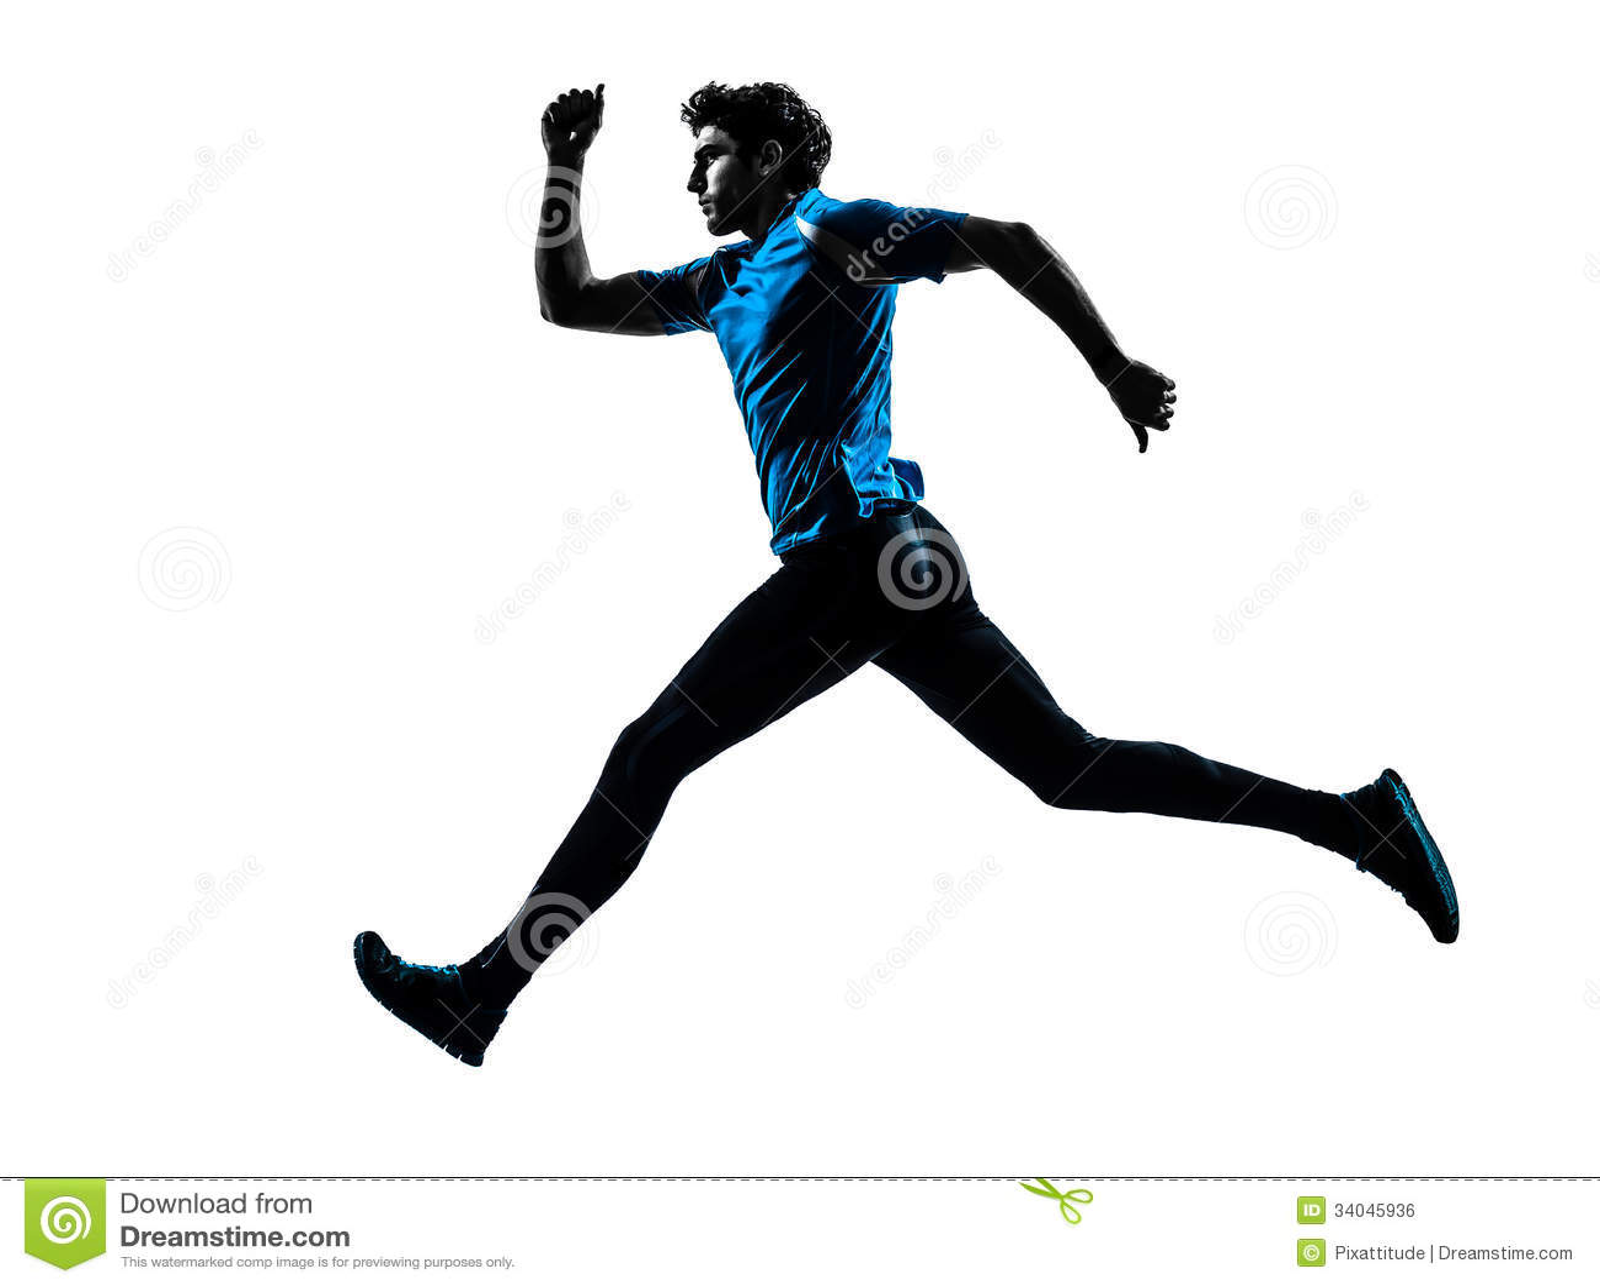 Man Runner Sprinter Jogger Silhouette Royalty Free Stock Image - Image ...